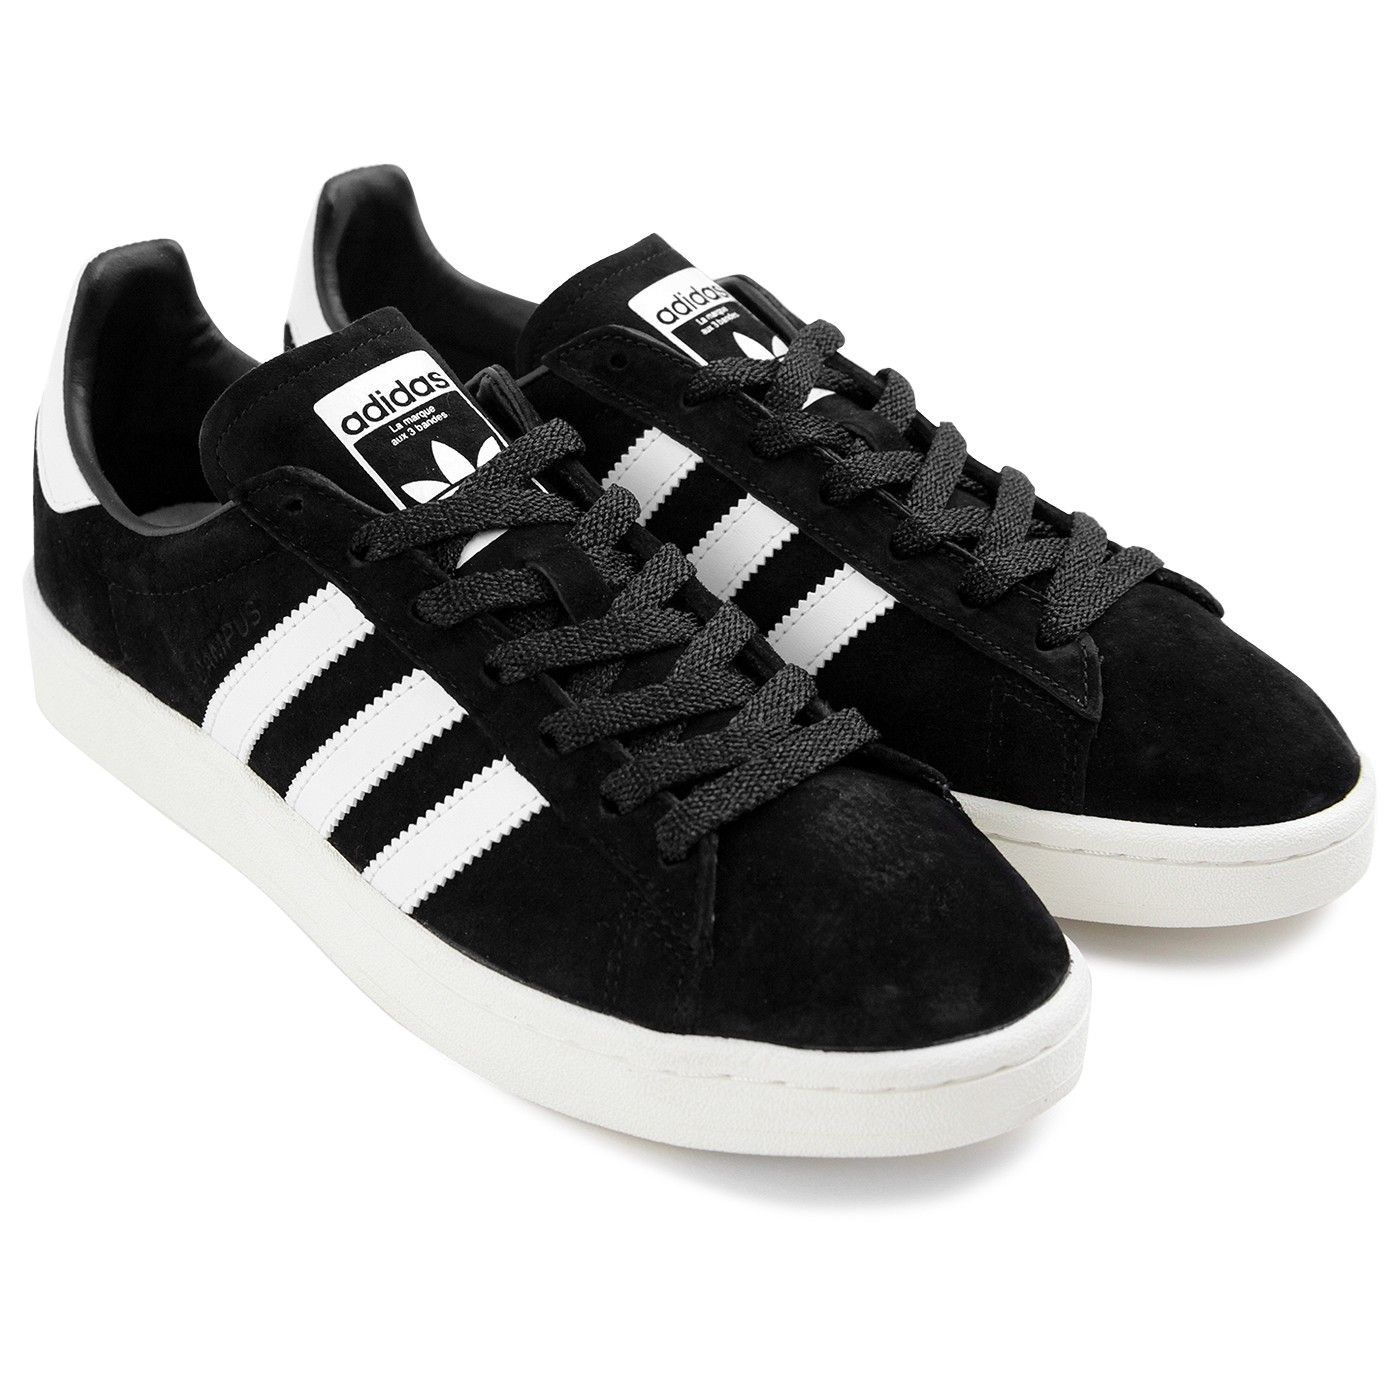 black adidas campus shoes